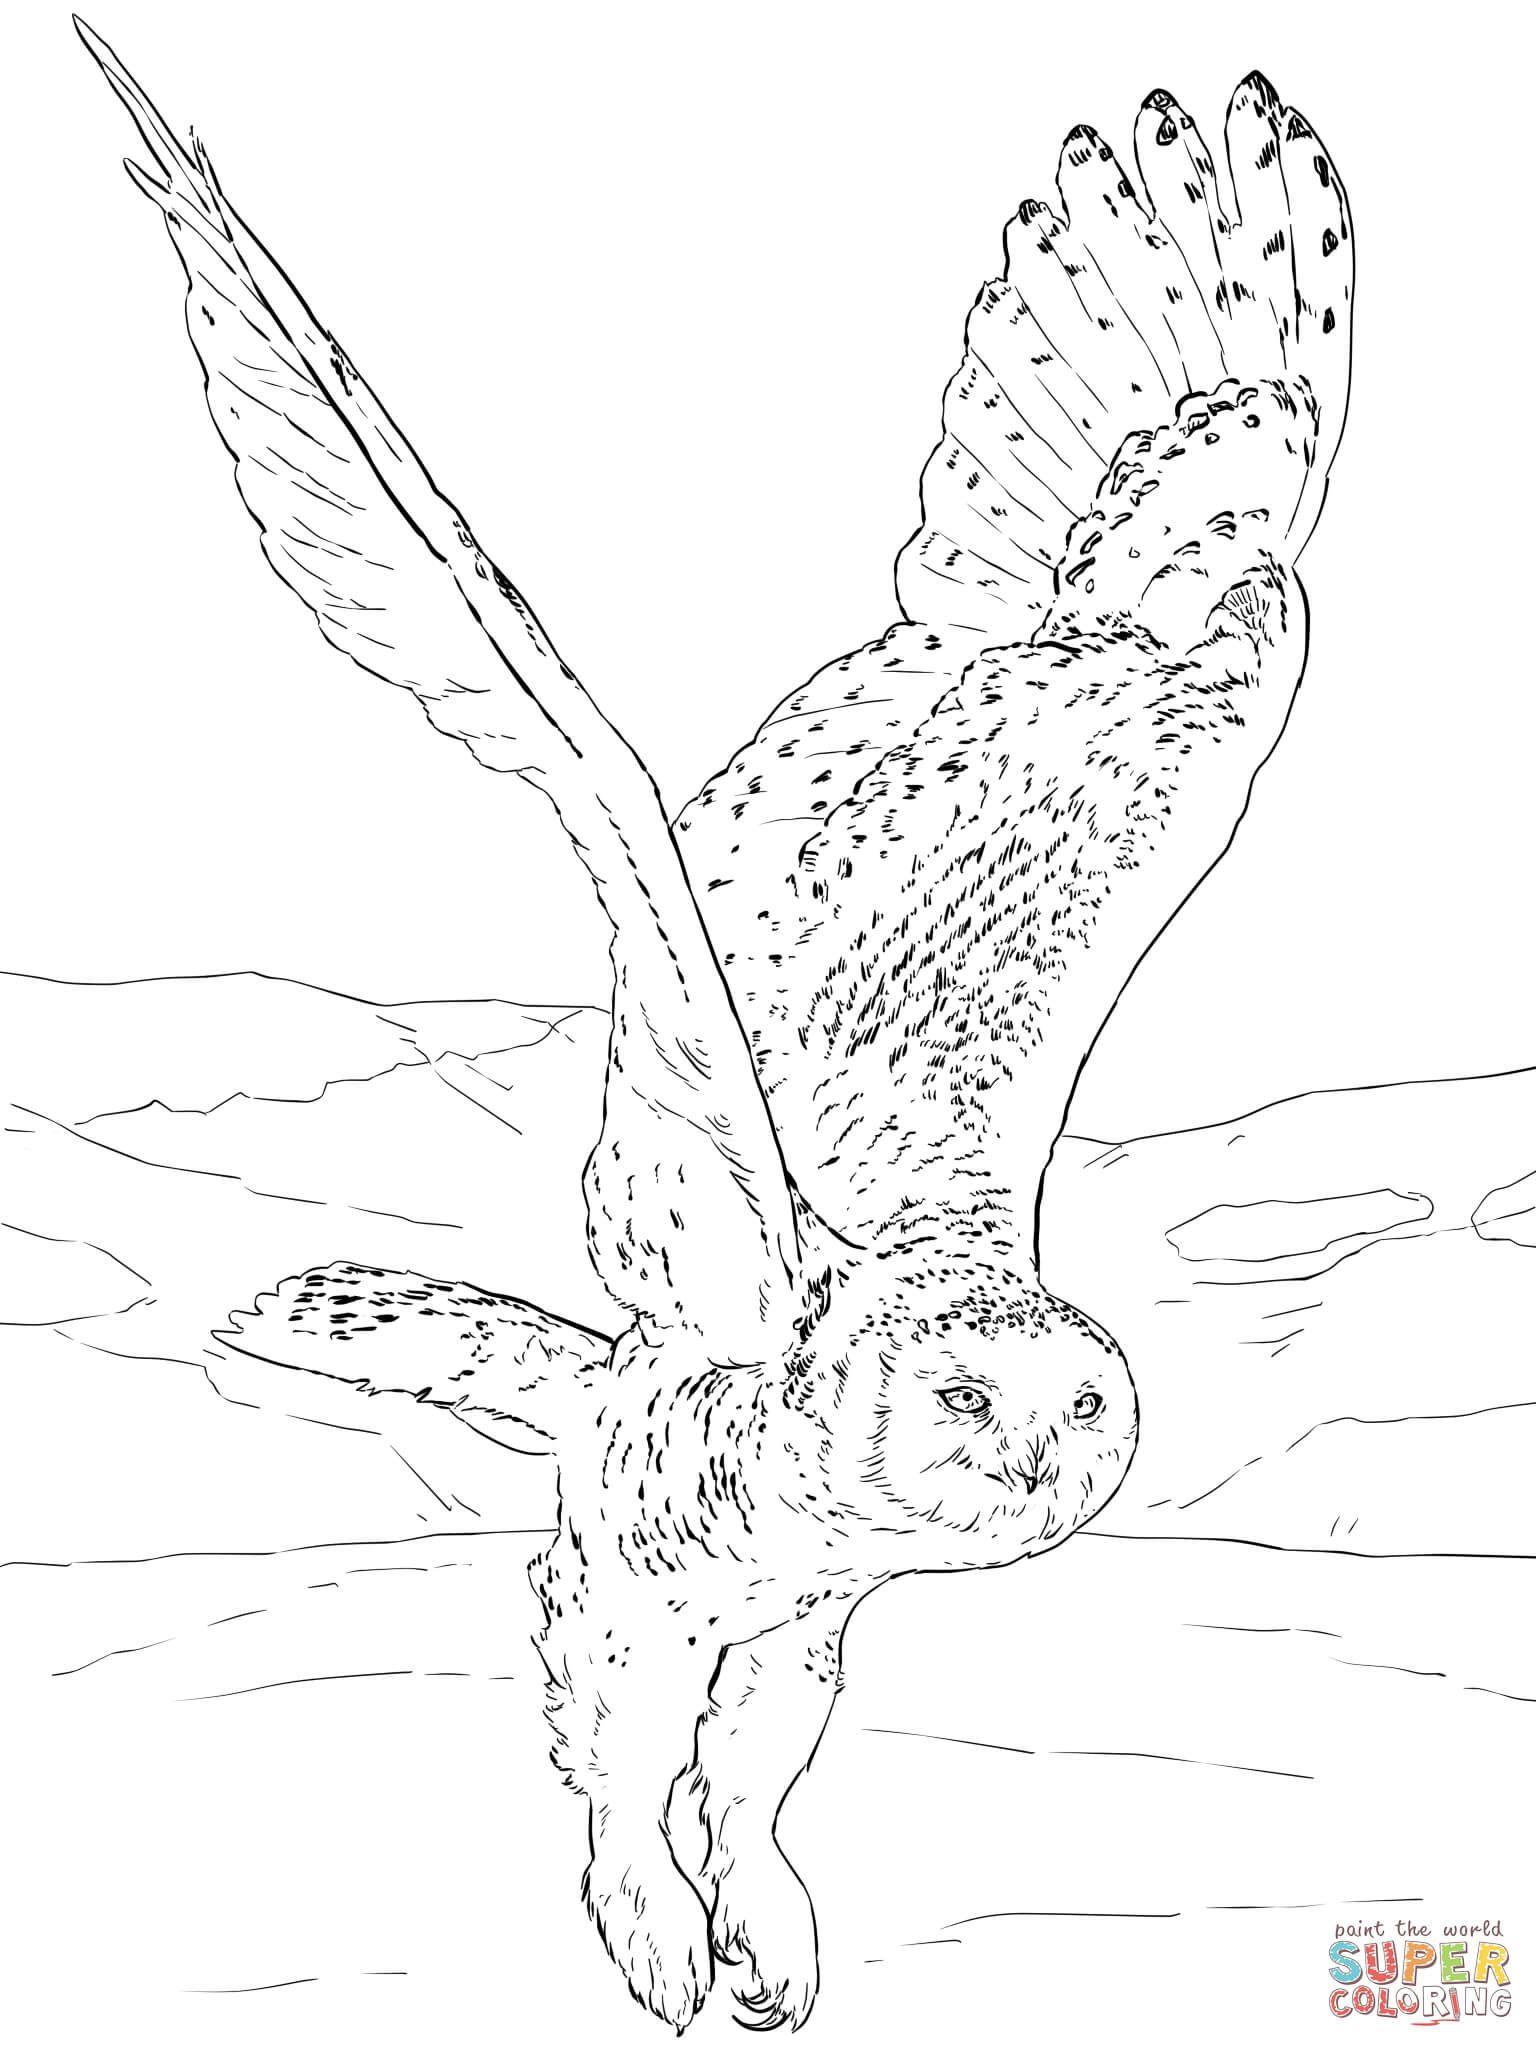 Pin de Małgorzata Kitka en Coloring pages - Owls | Pinterest | Volar ...